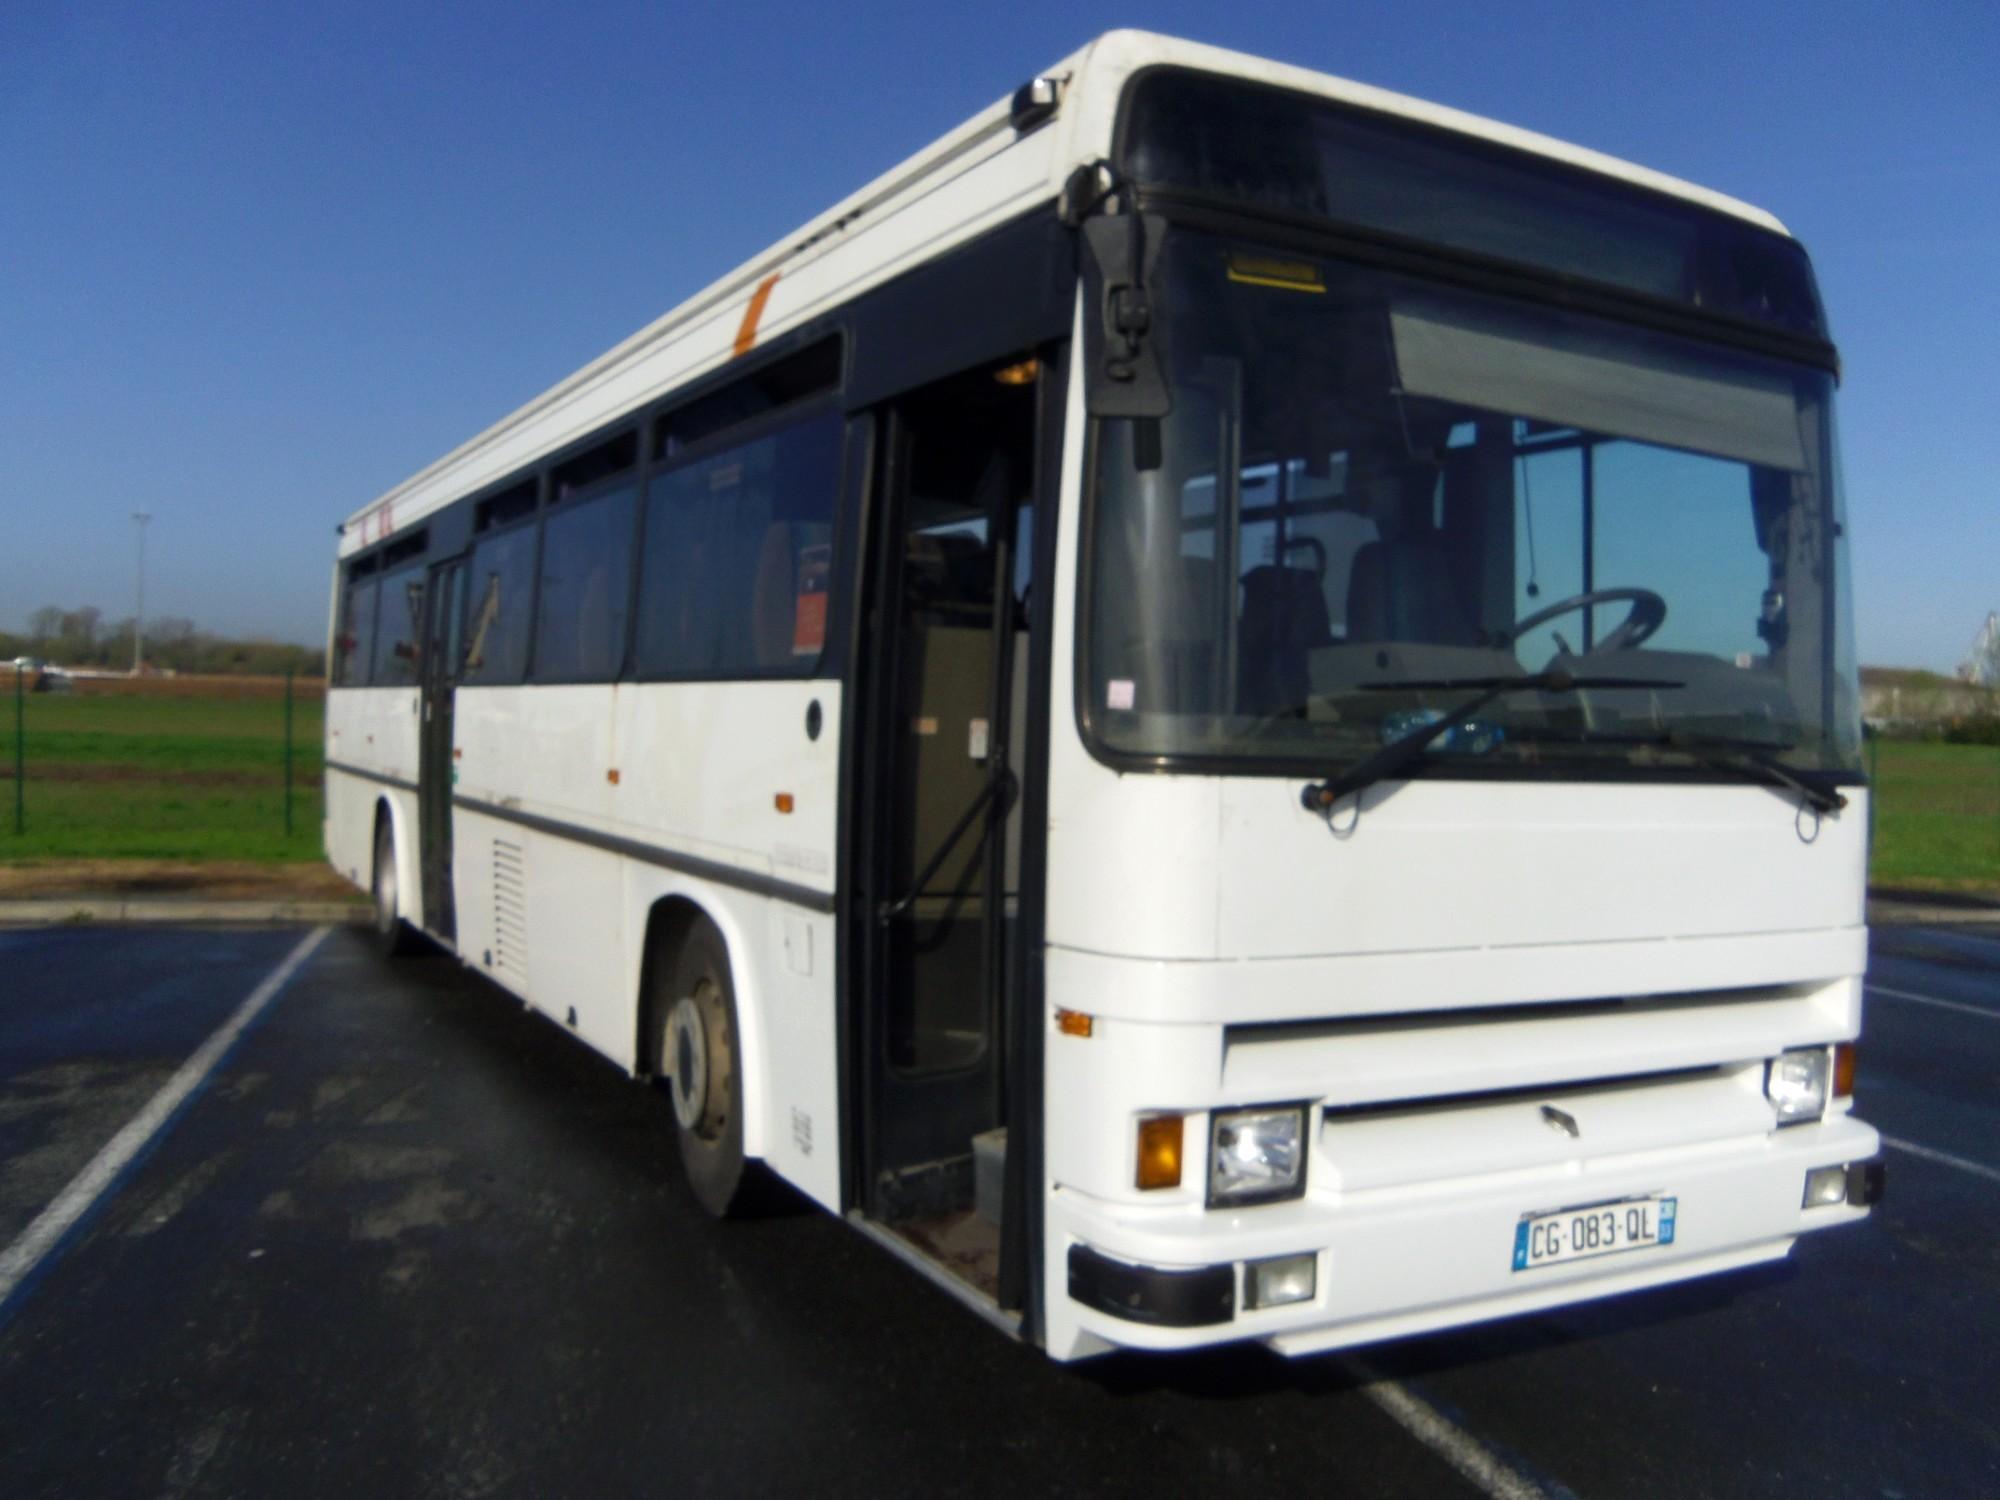 irisbus tracer 7277 car bus d 39 occasion aux ench res agorastore. Black Bedroom Furniture Sets. Home Design Ideas